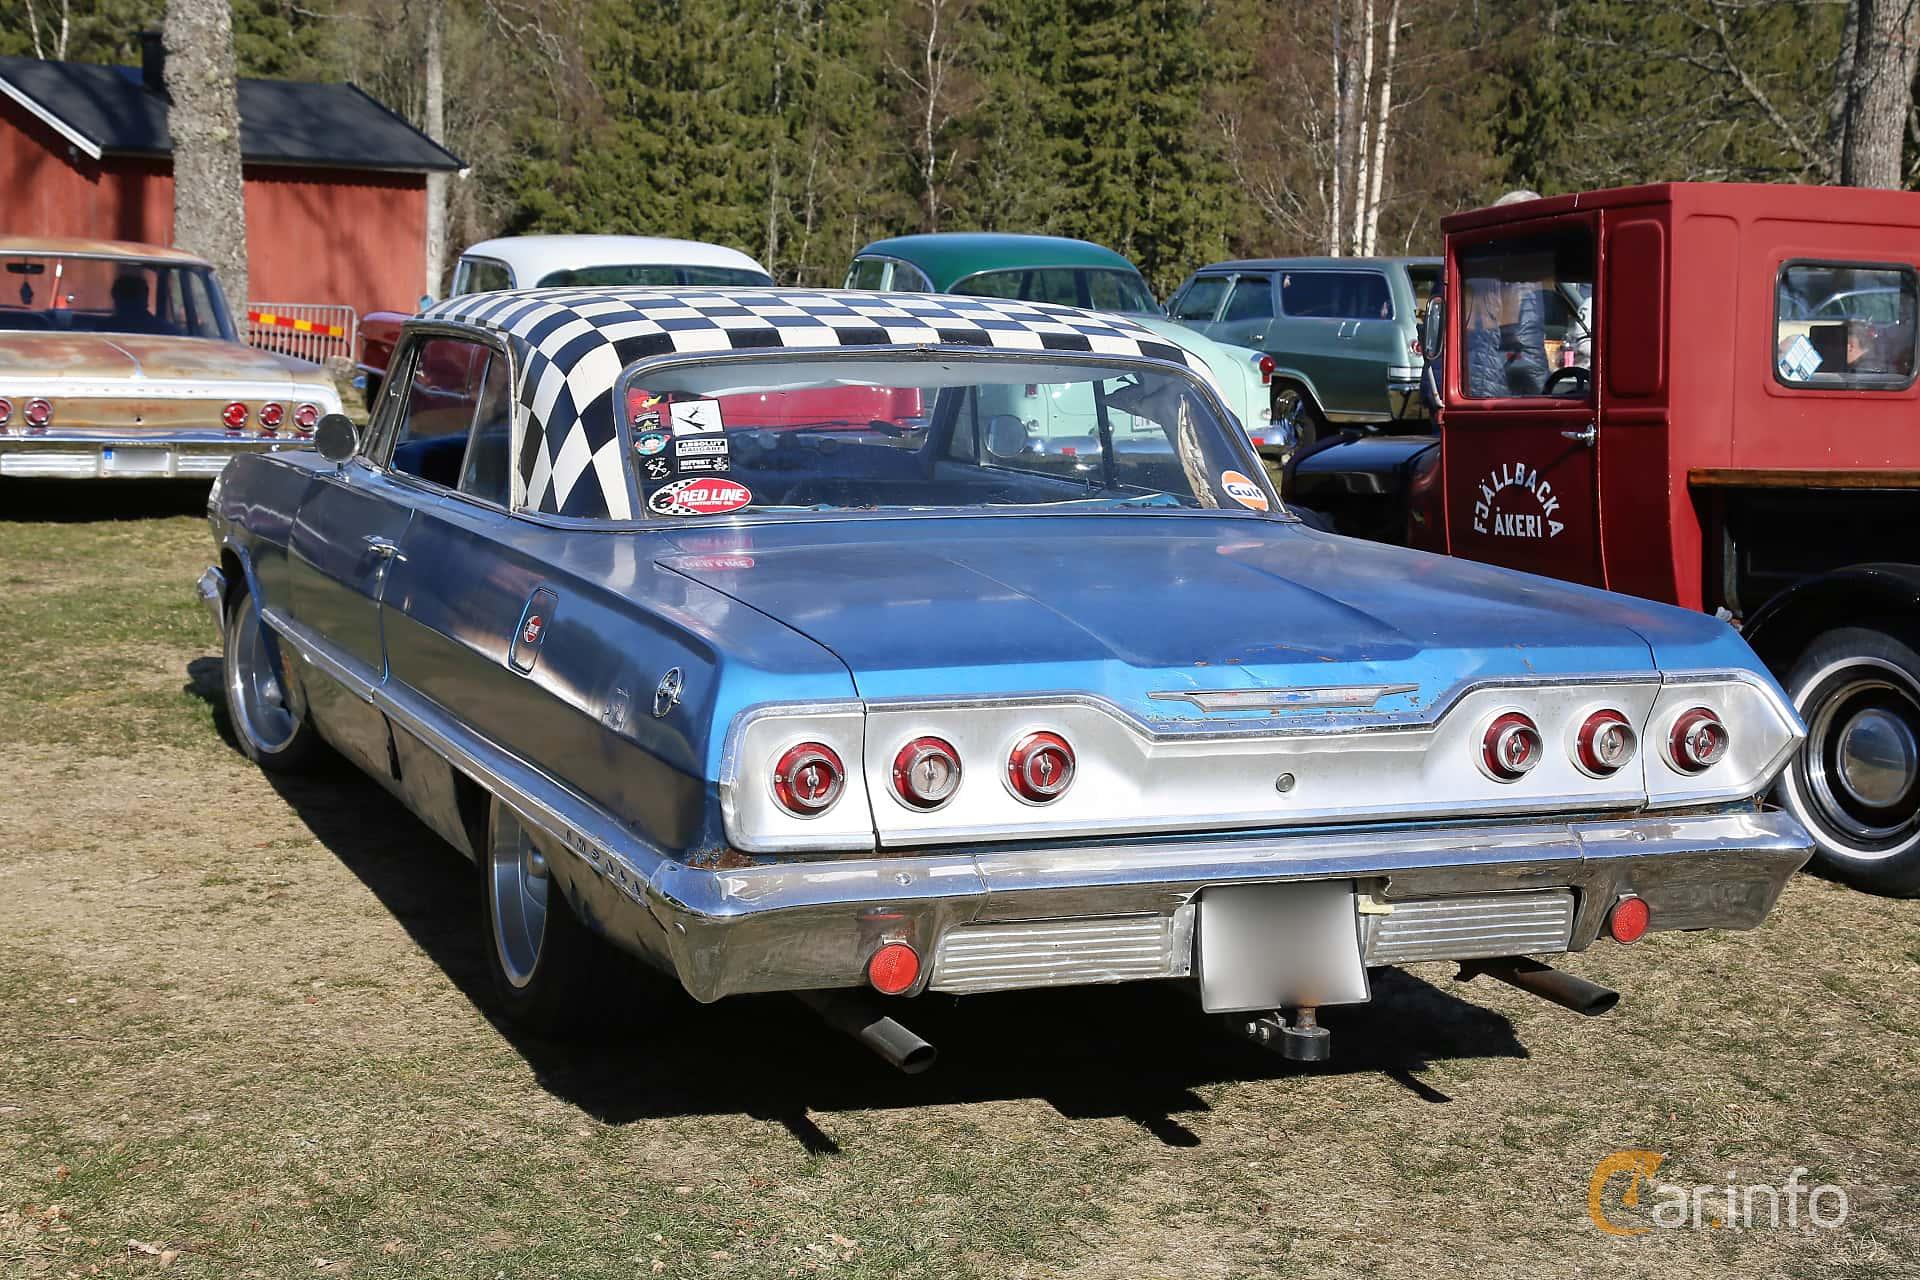 Back/Side of Chevrolet Impala Sport Coupé 4.6 V8 Powerglide, 198ps, 1963 at Uddevalla Veteranbilsmarknad Backamo, Ljungsk 2019